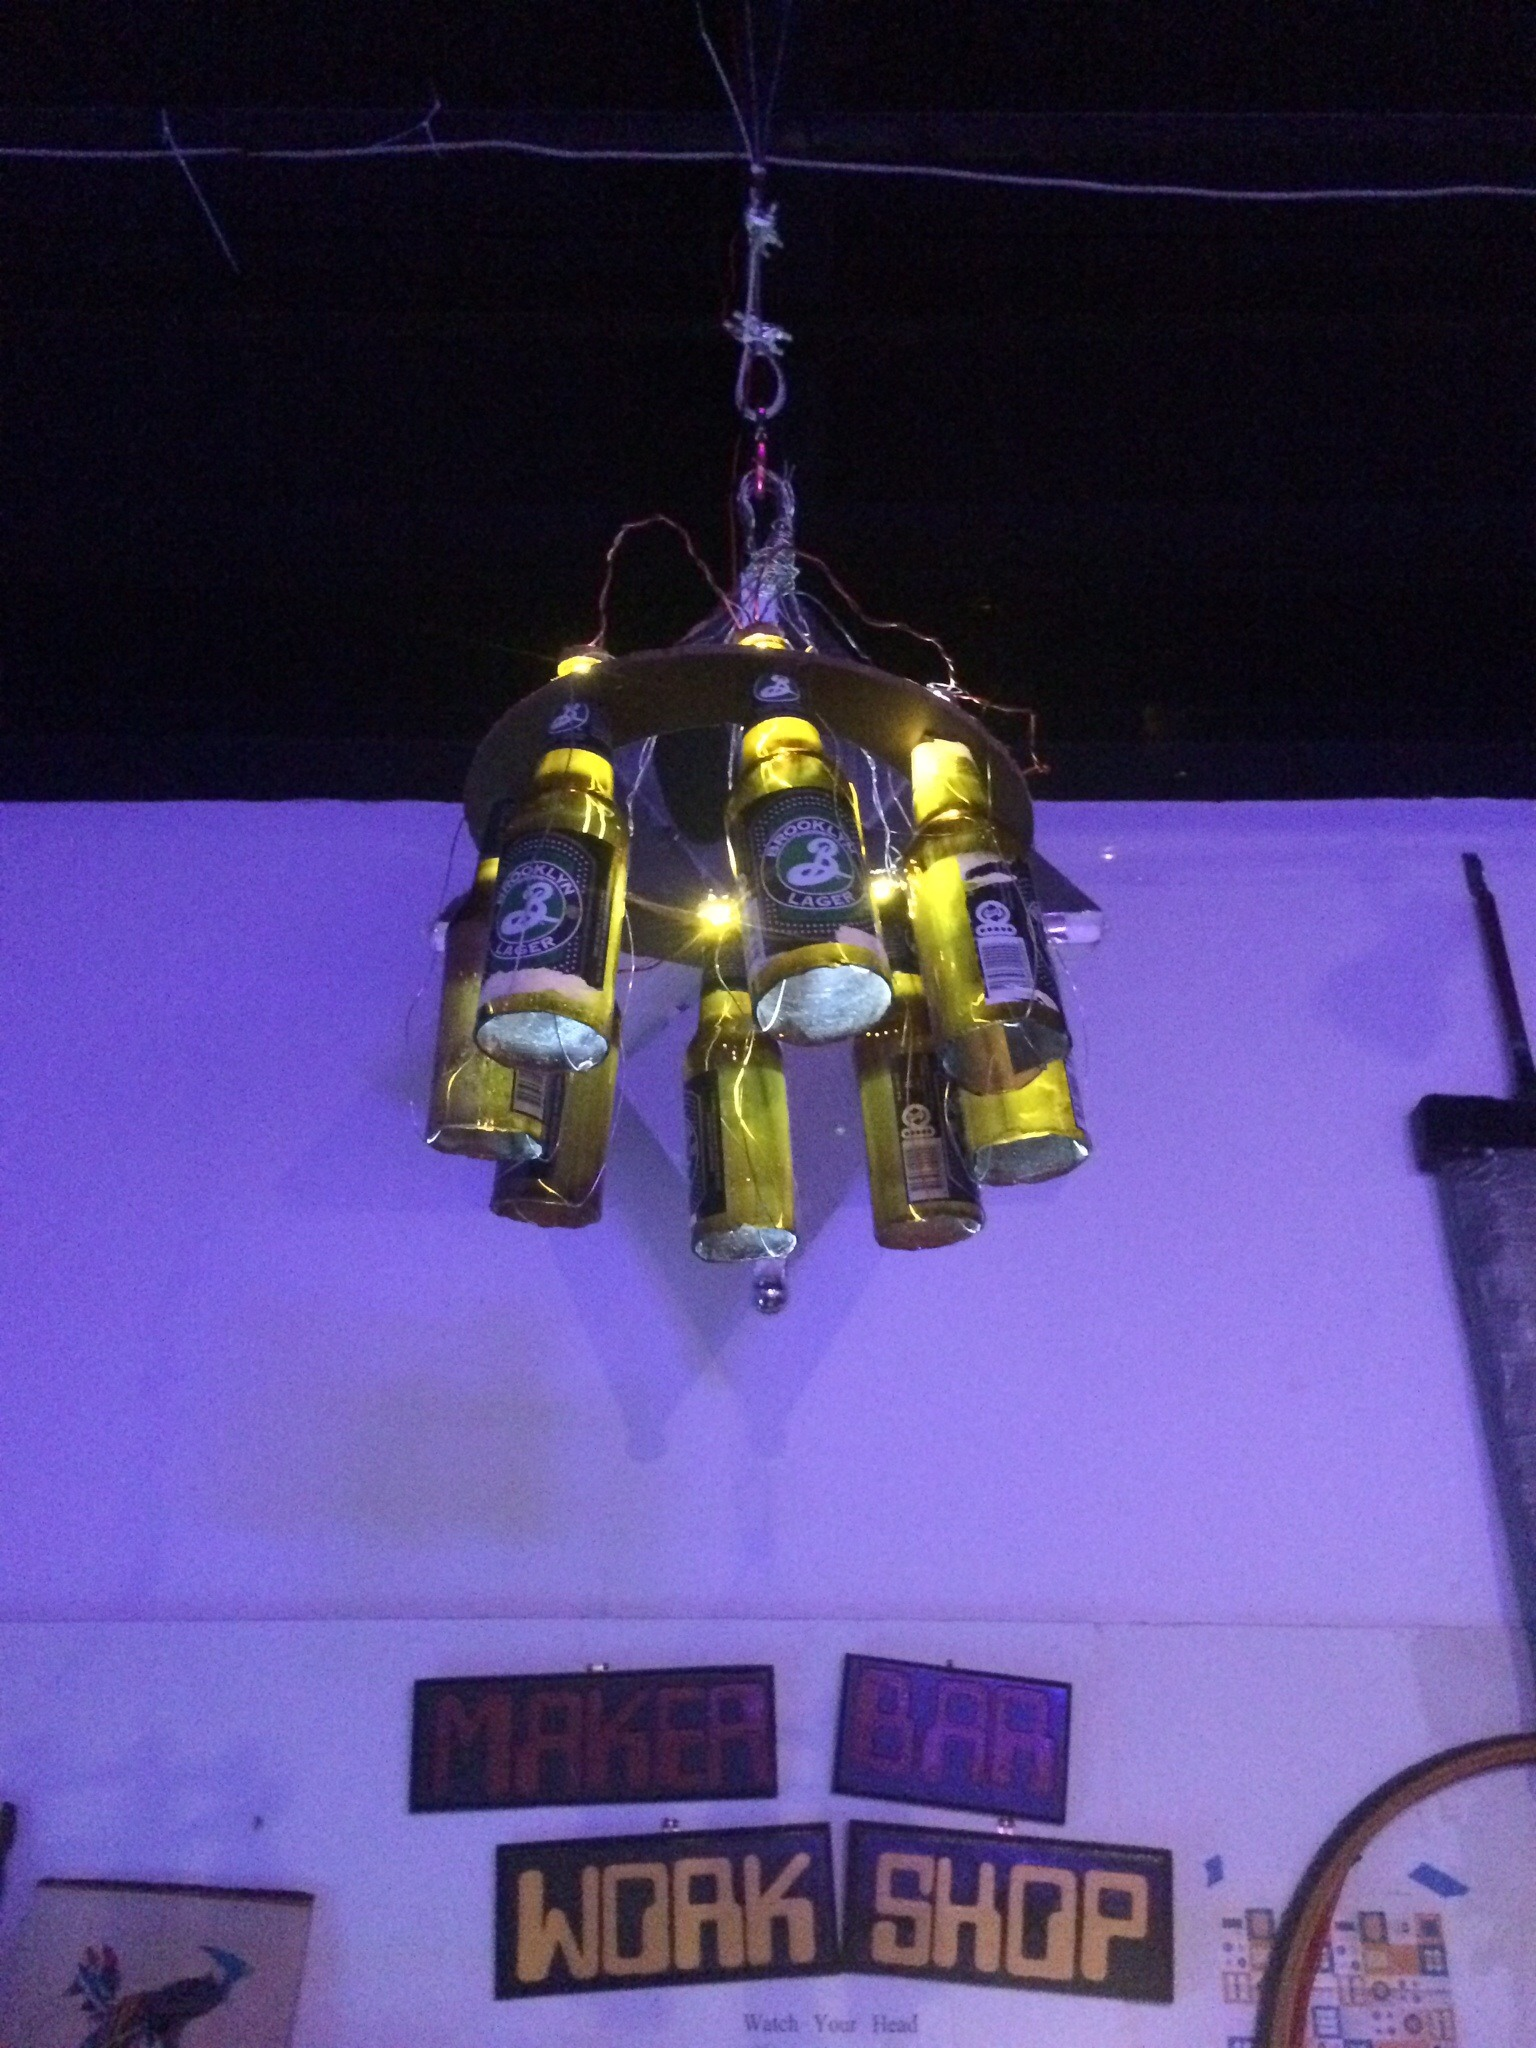 ChandiliBeer: The LED Beer Bottle Chandelier